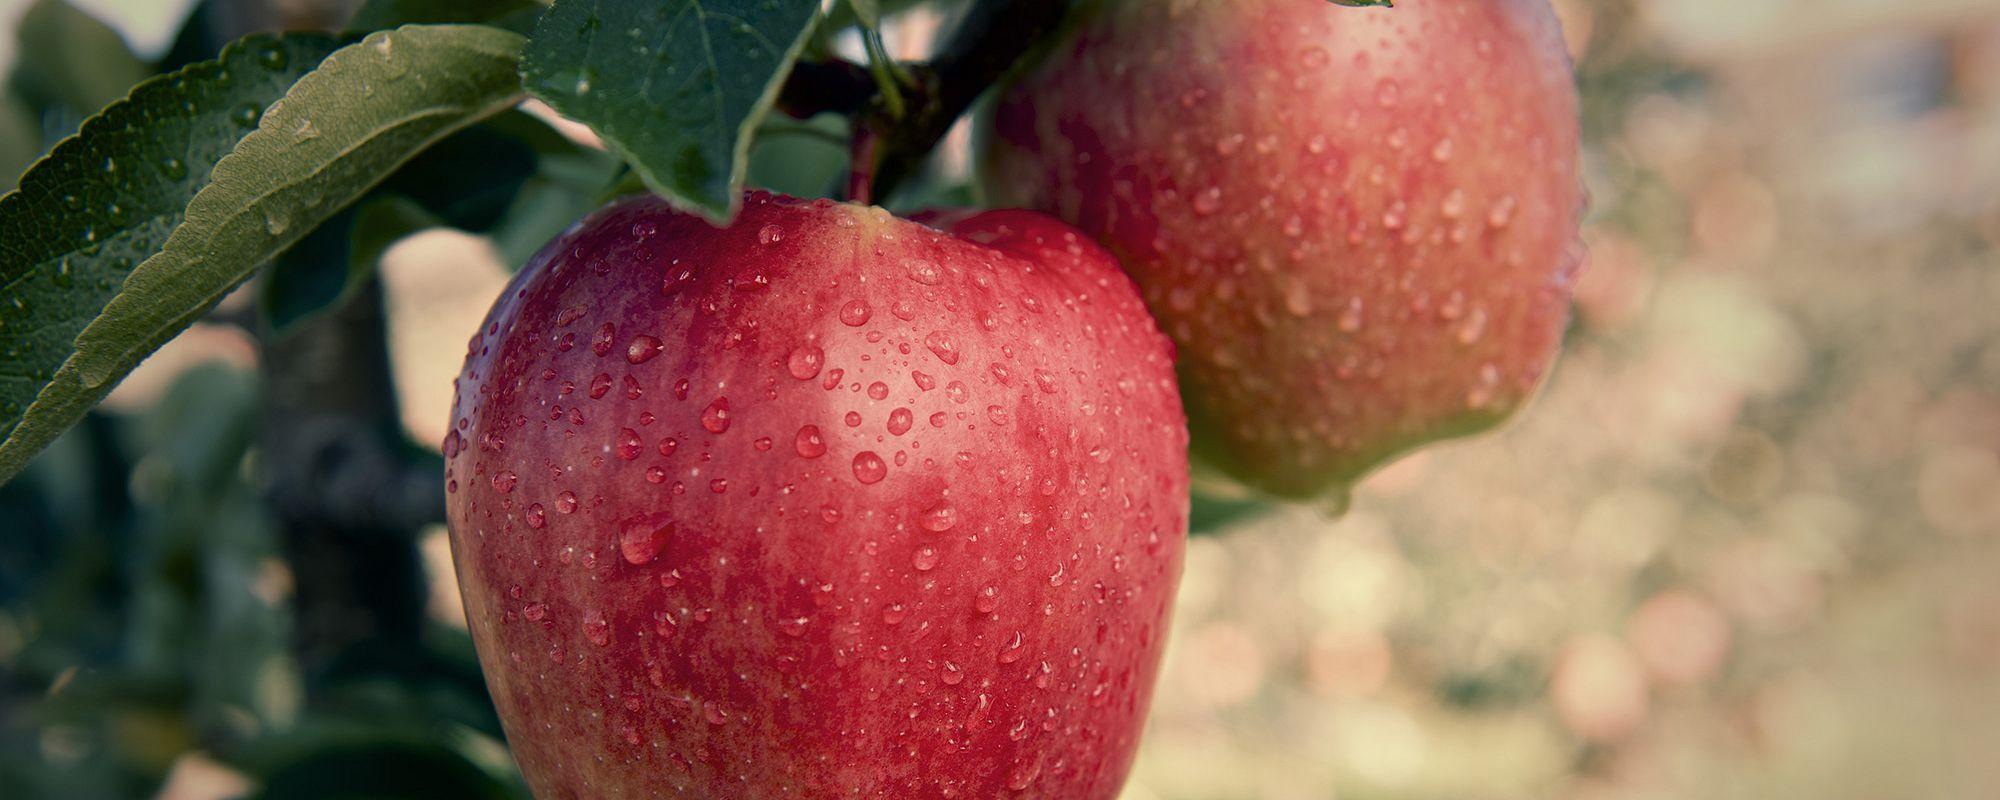 Apples bc tree fruits cooperative apples voltagebd Gallery